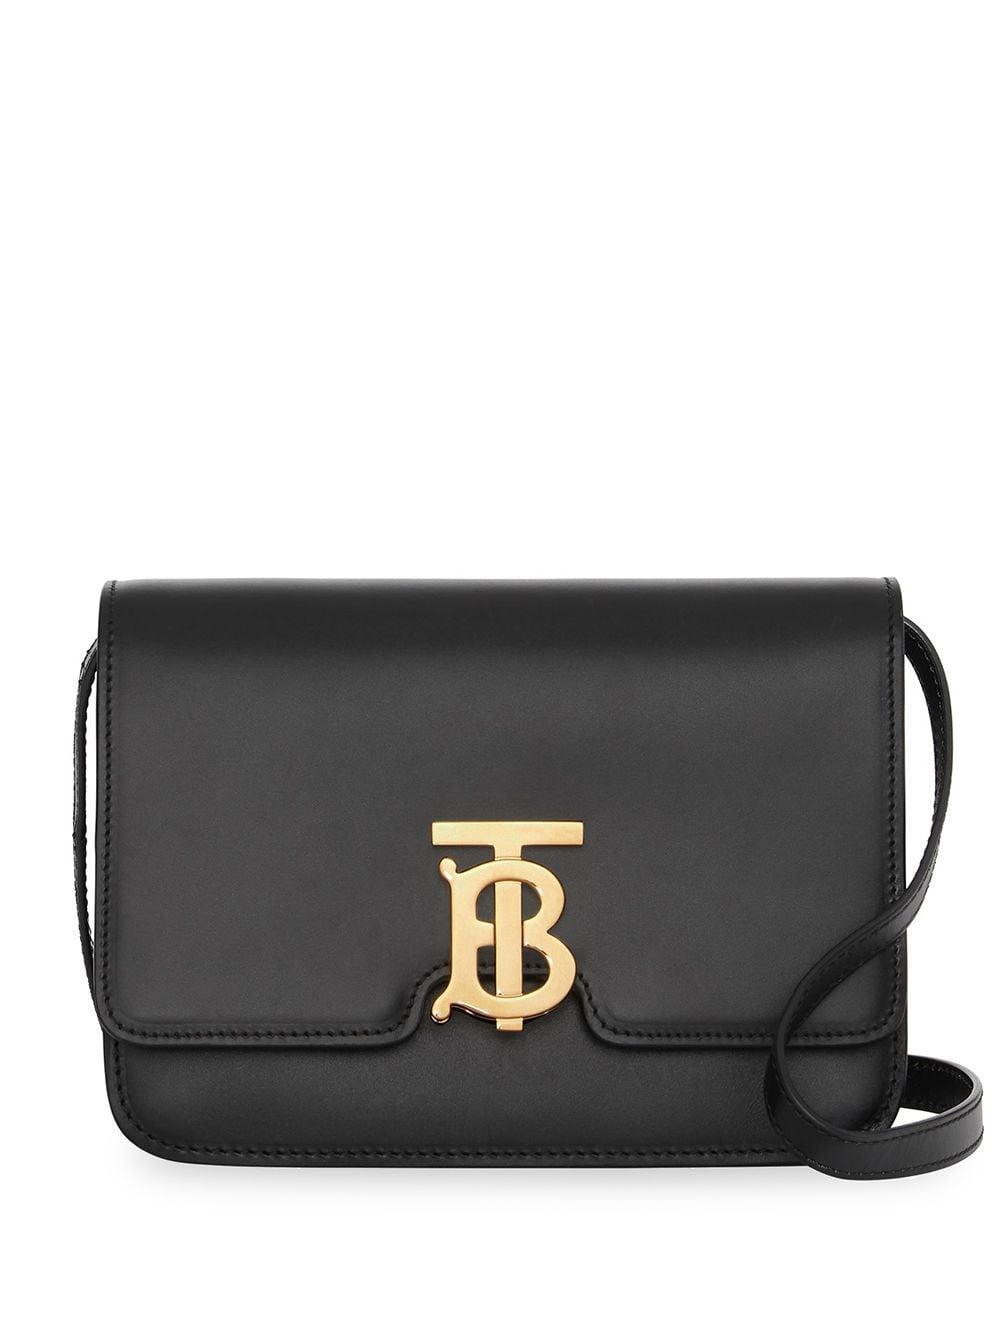 Lola Small Leather Crossbody Bag